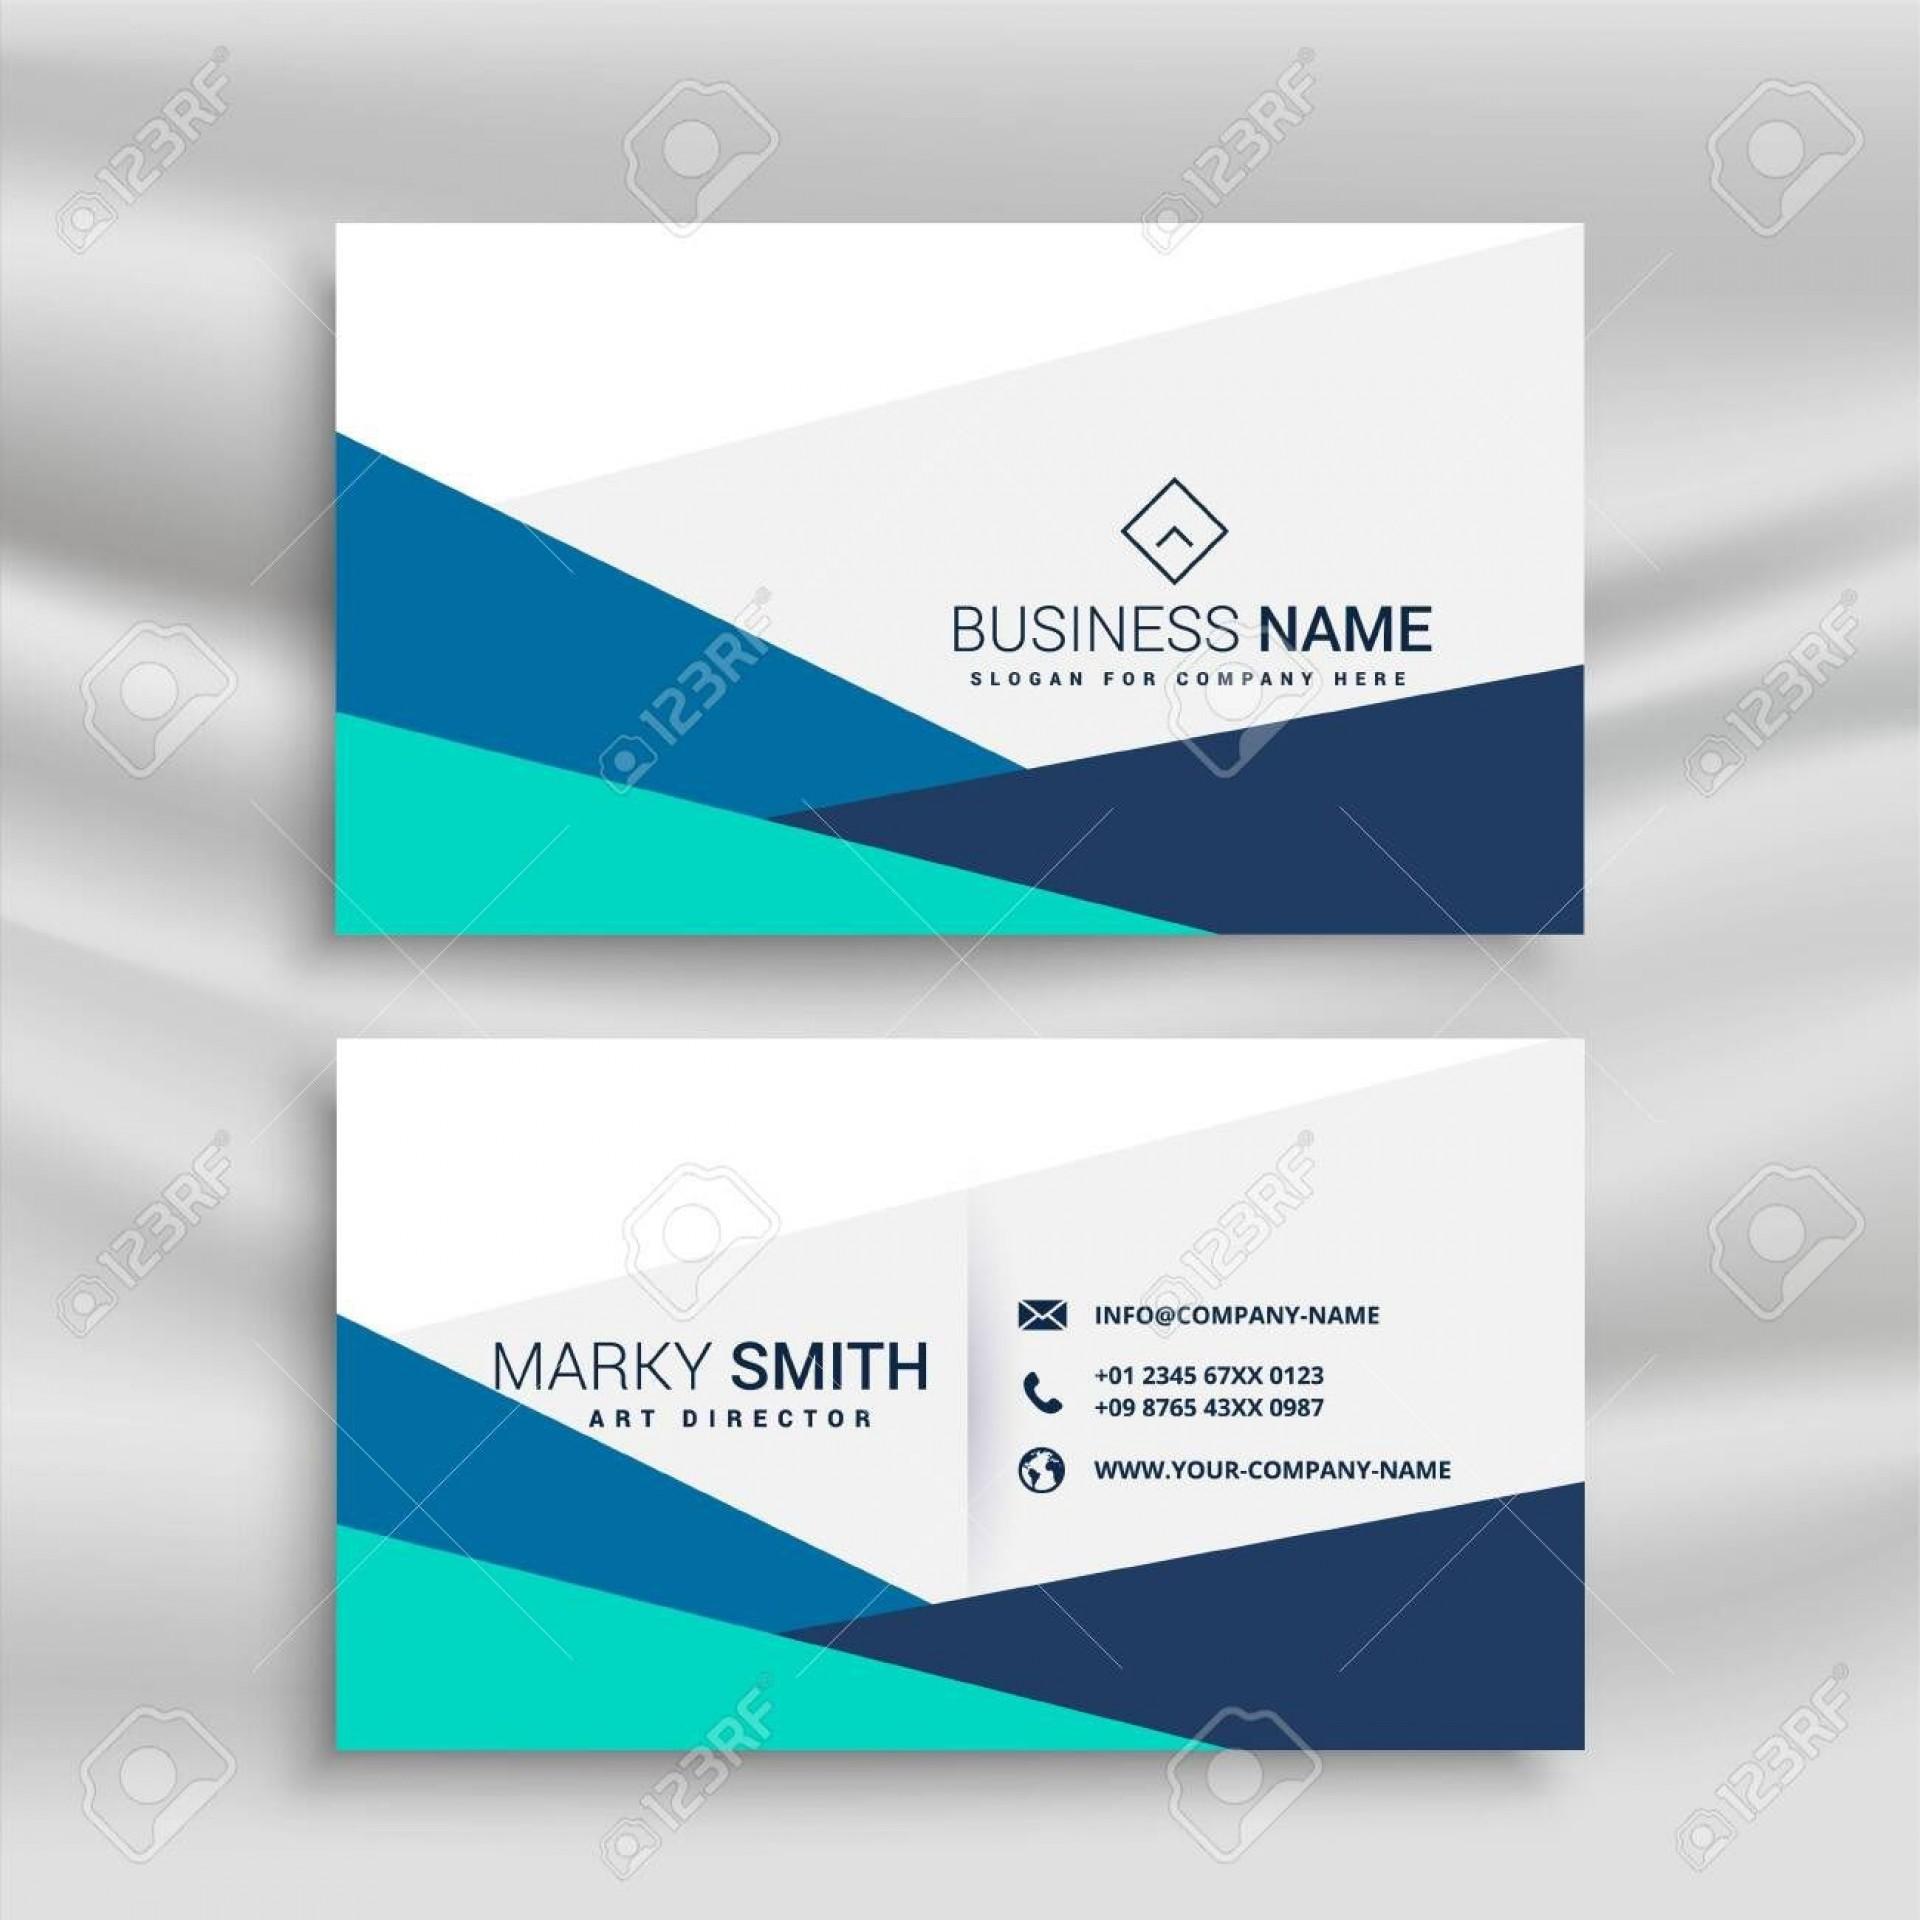 001 Sensational Simple Visiting Card Design Example  Busines Idea Psd File Free Download1920